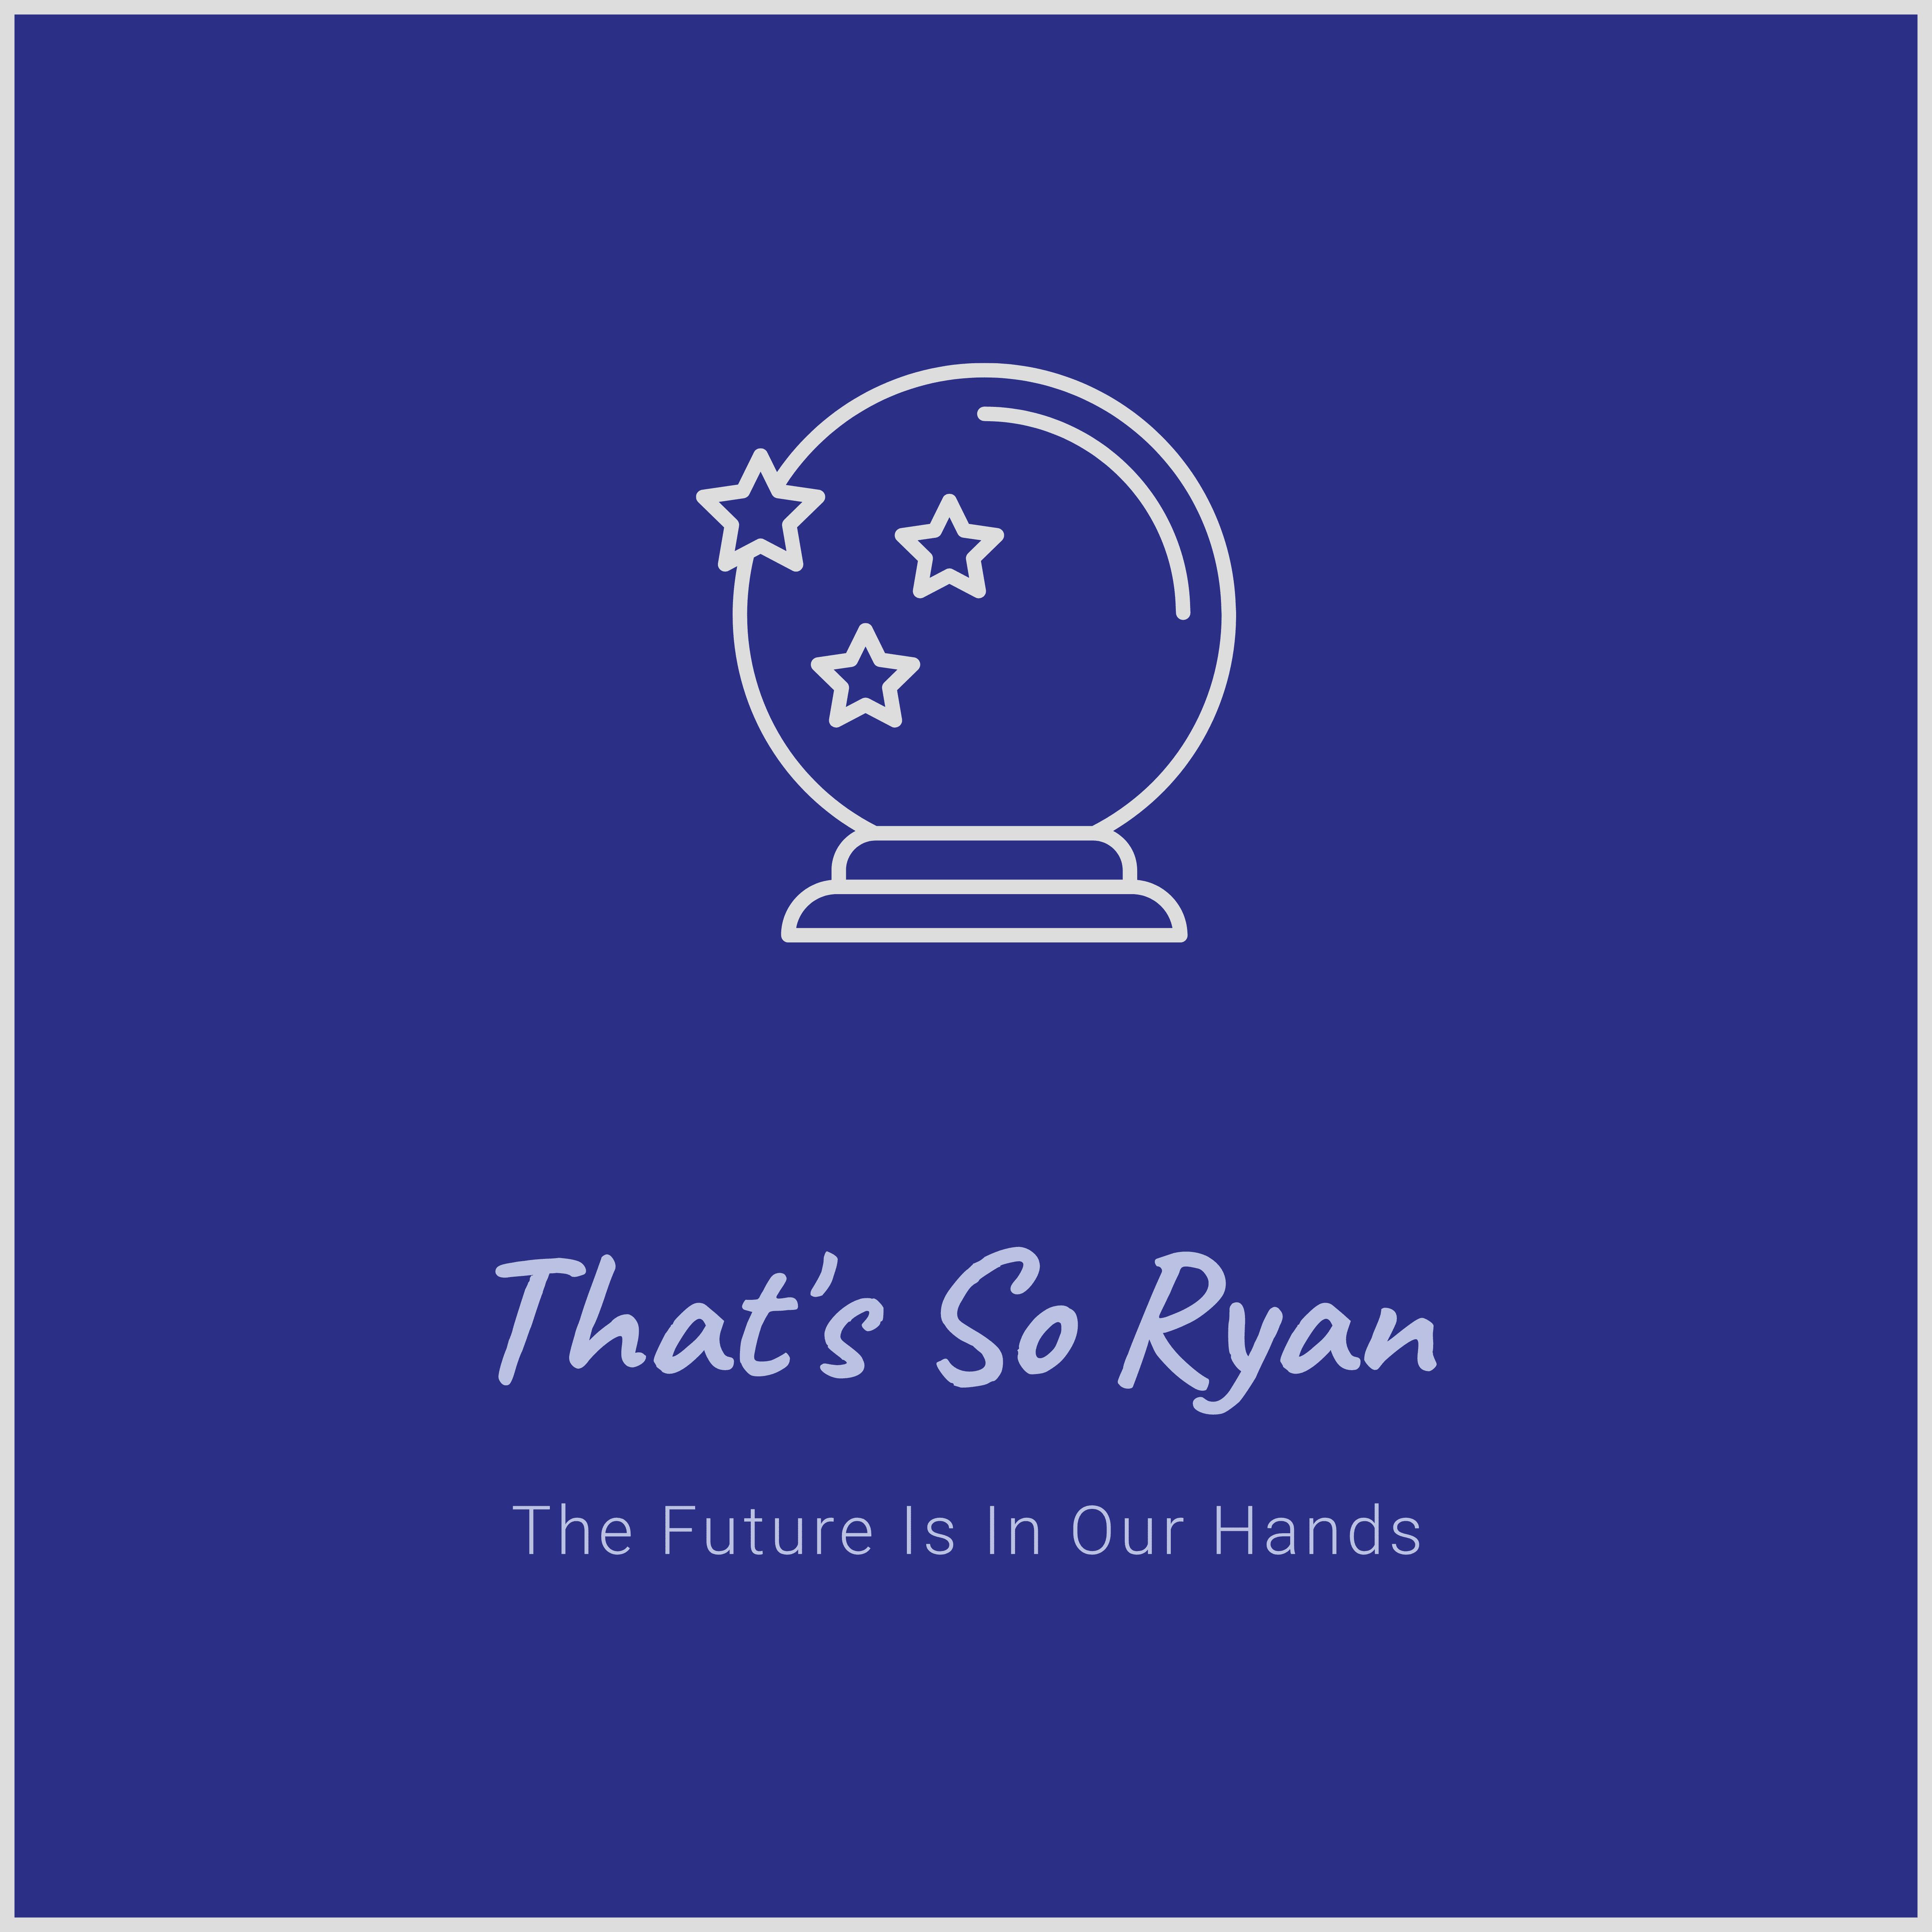 That's So Ryan